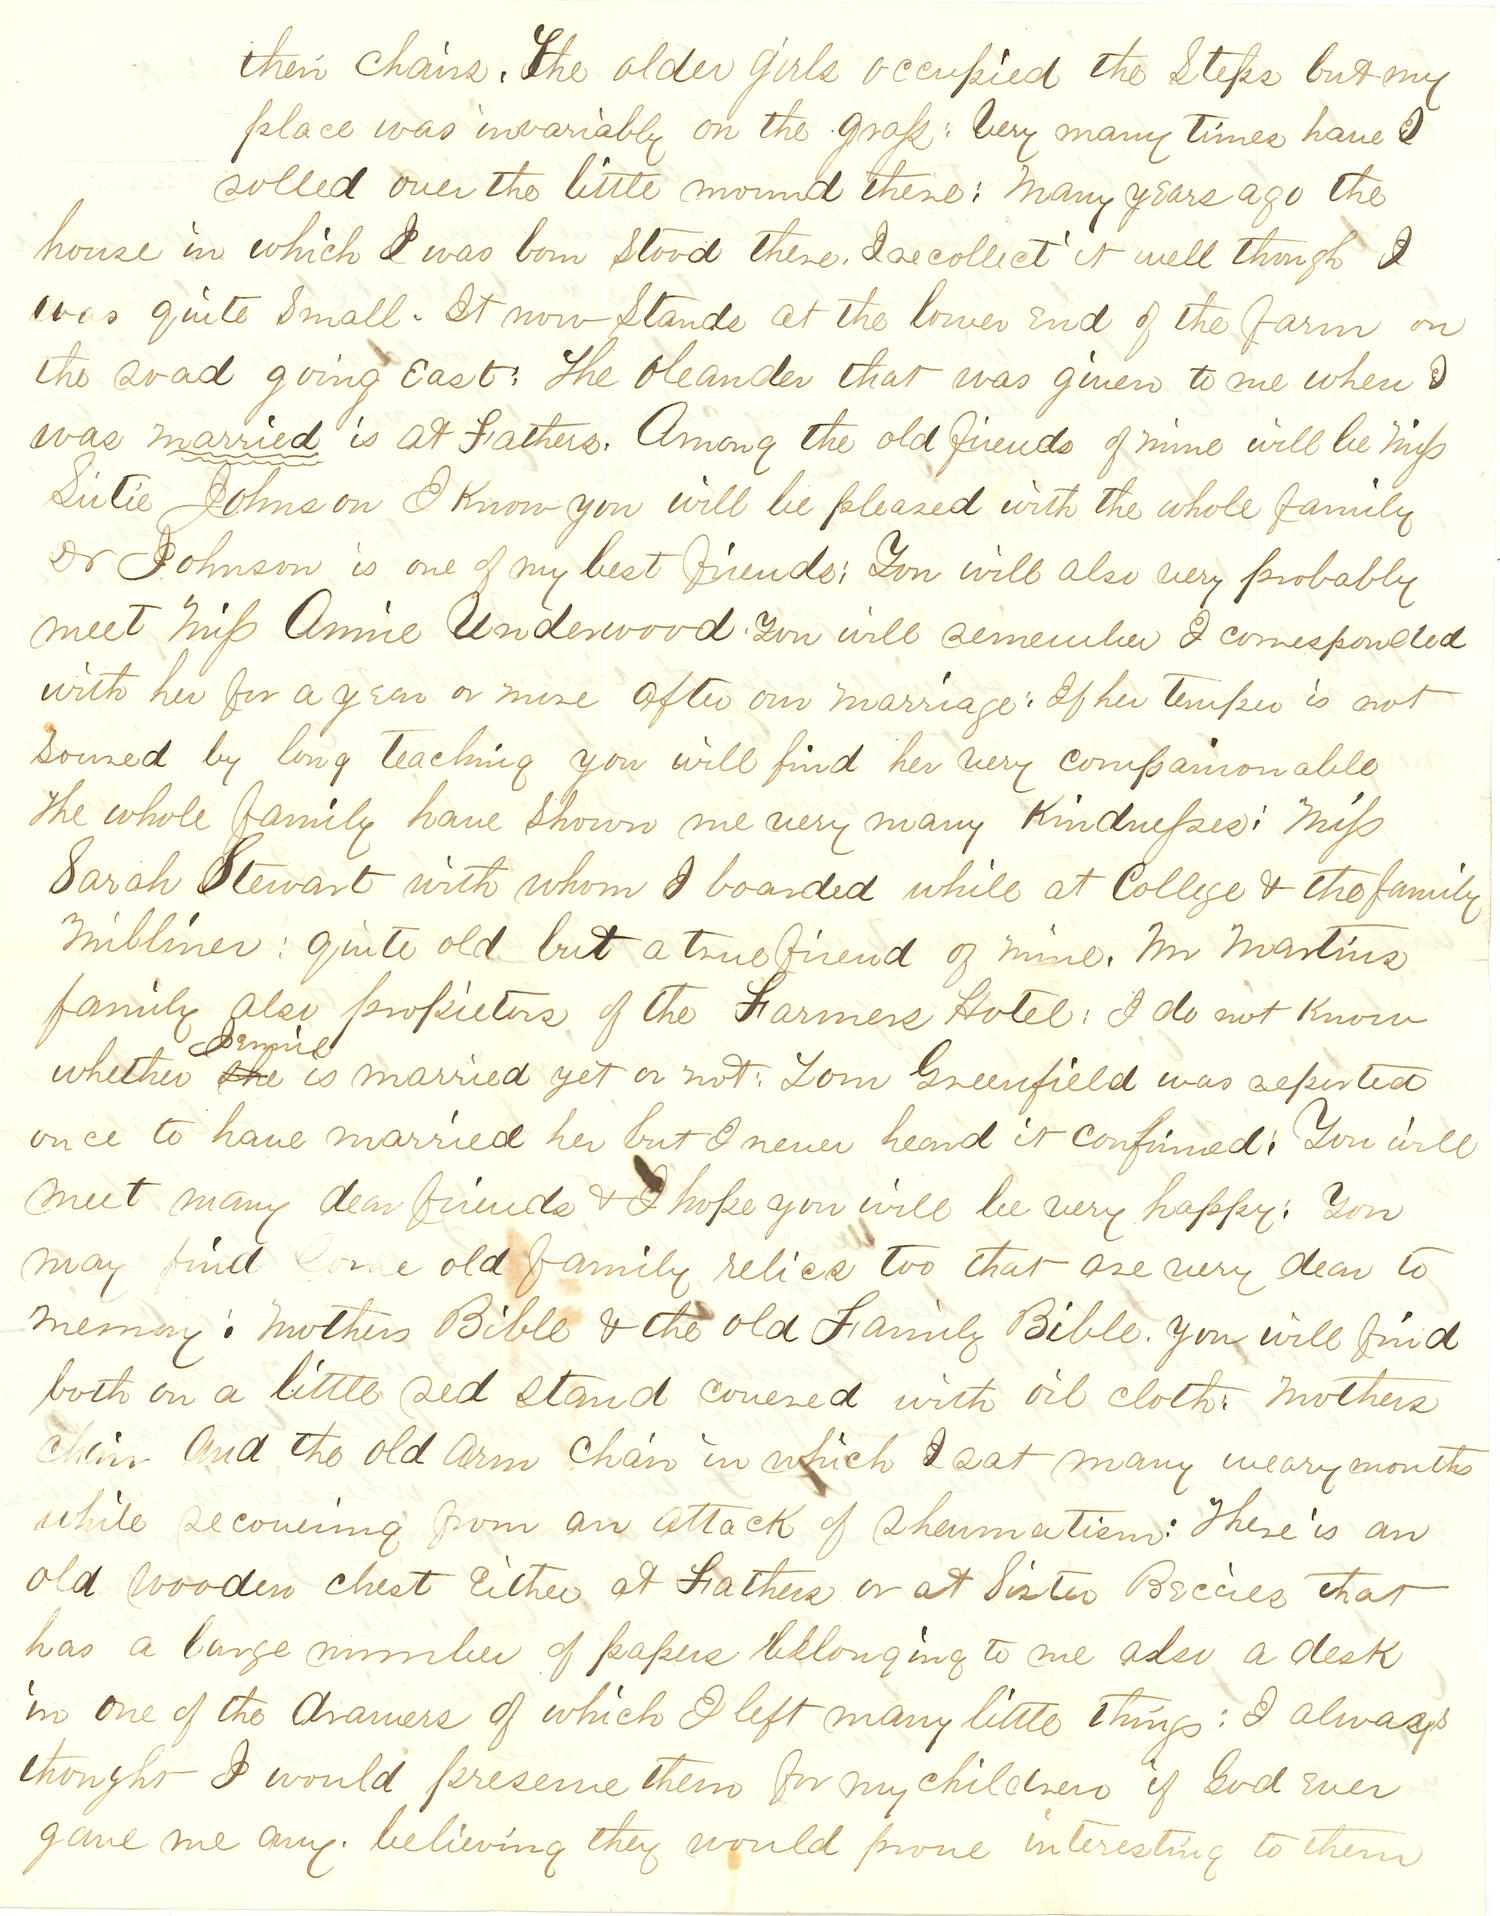 Joseph Culver Letter, August 19, 1863, Page 3